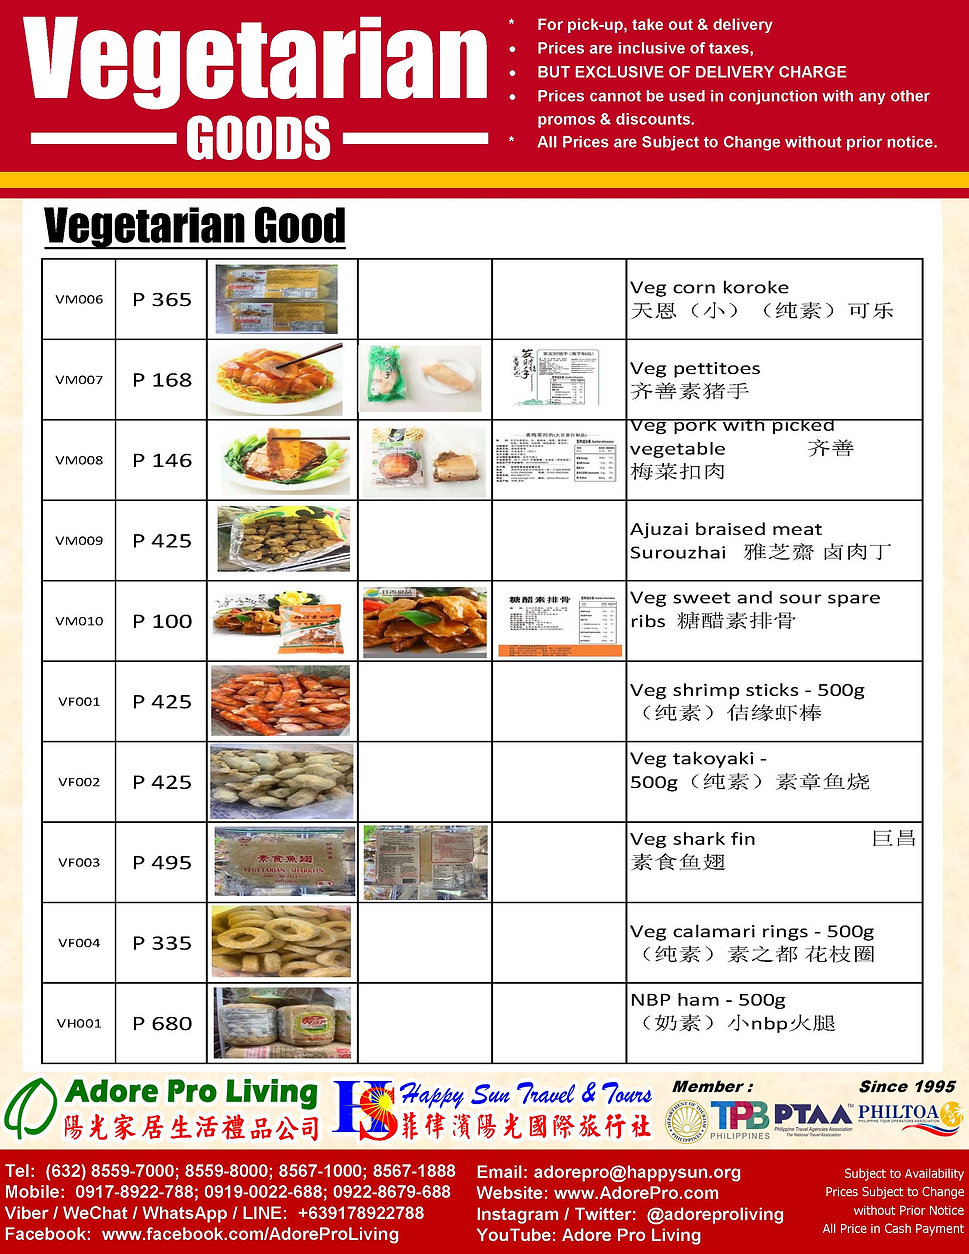 P7_Vegetarian Goods_20200929.jpg